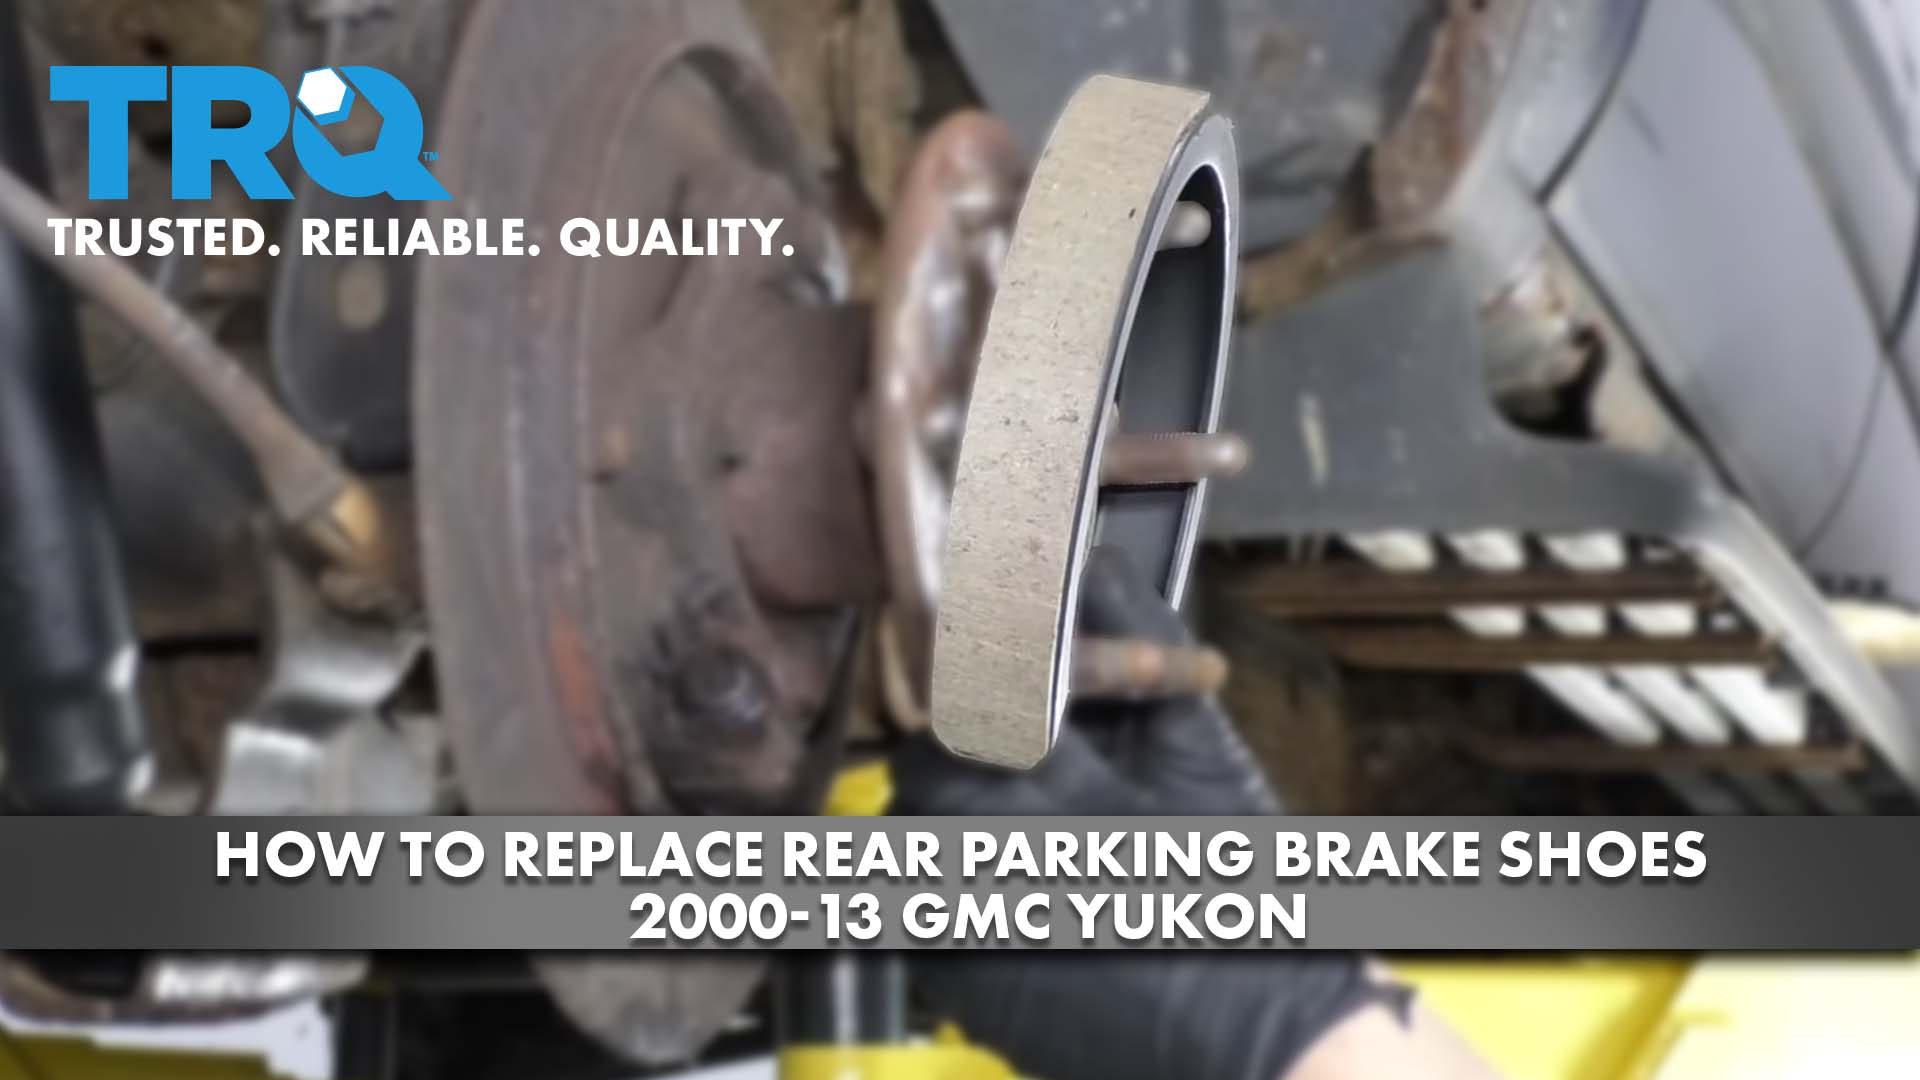 How to Replace Rear Parking Brake Shoes 2000-13 GMC Yukon